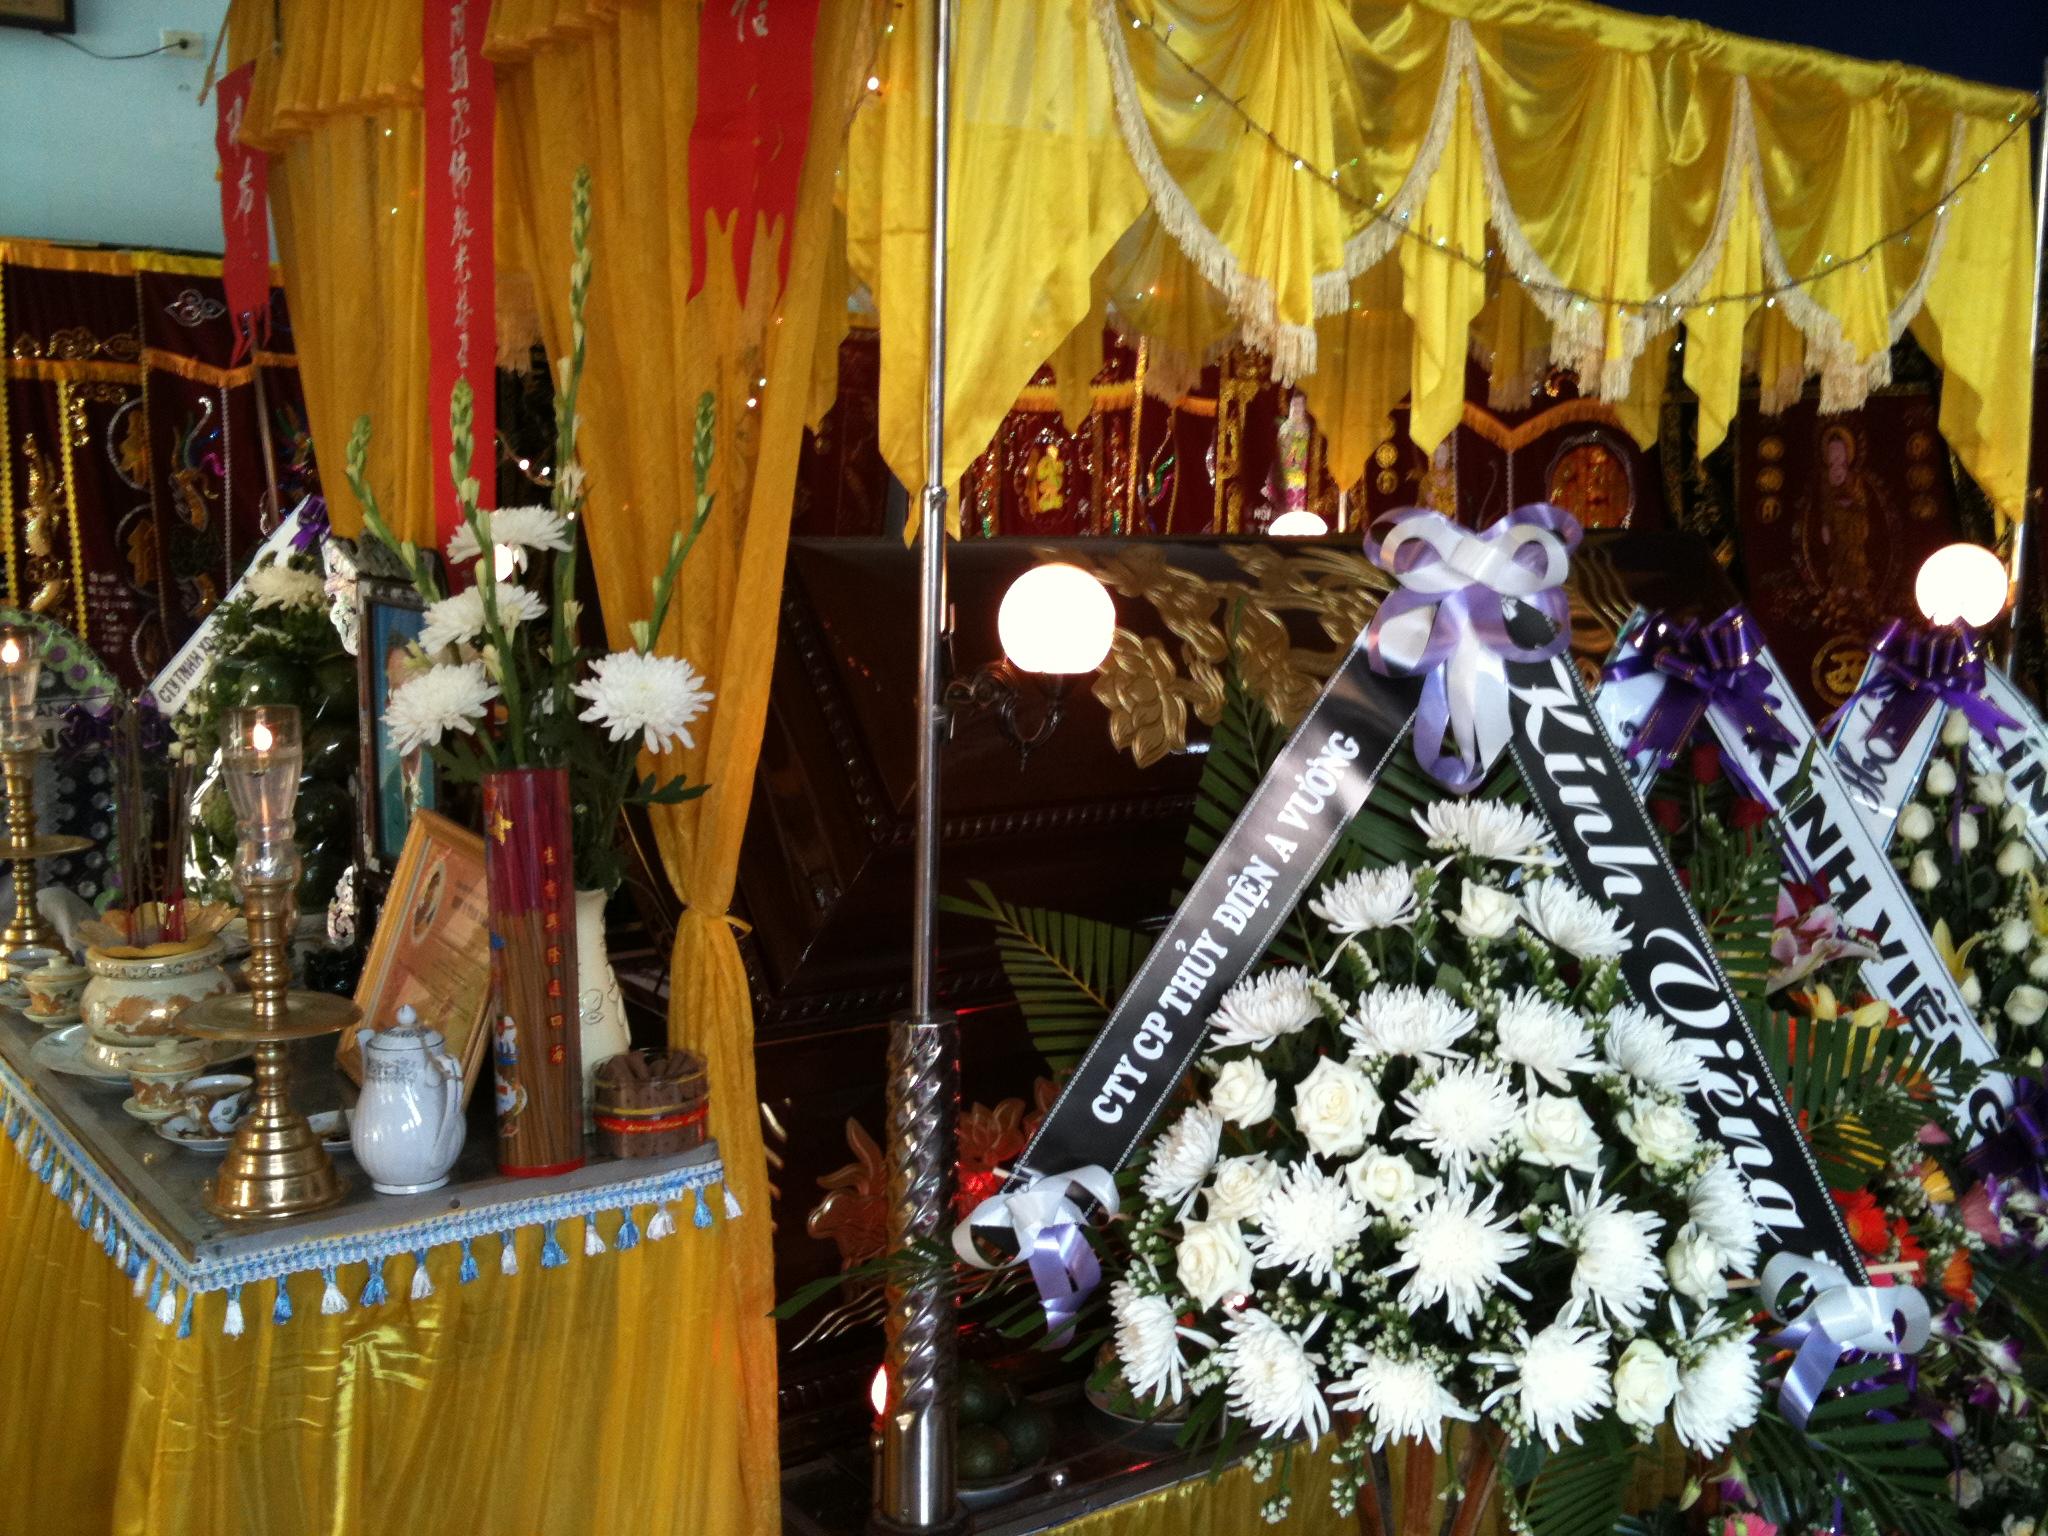 File:Funeral Decorations Danang.JPG - Wikimedia Commons